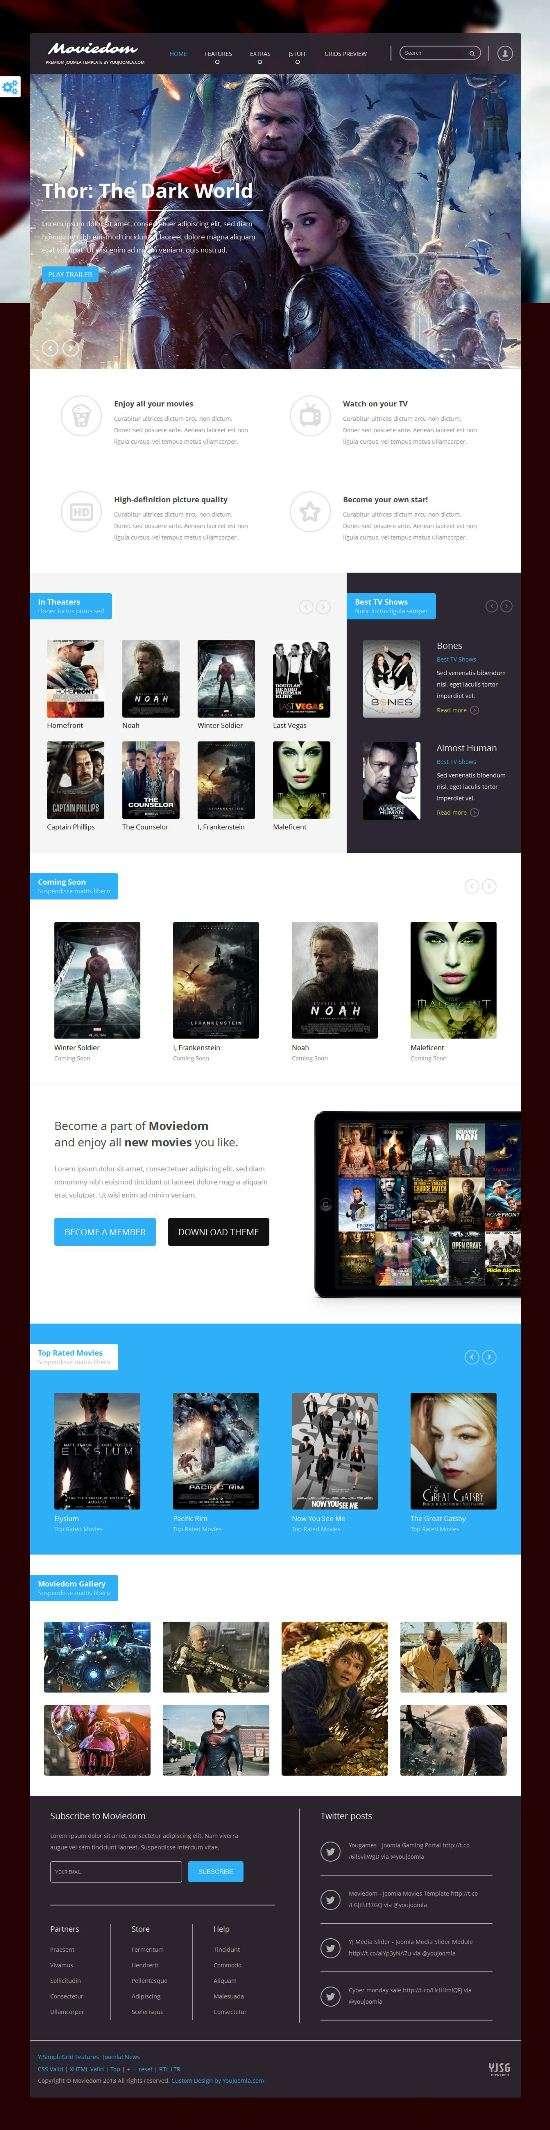 moviedom youjoomla avjthemescom 01 - Moviedom Joomla Template